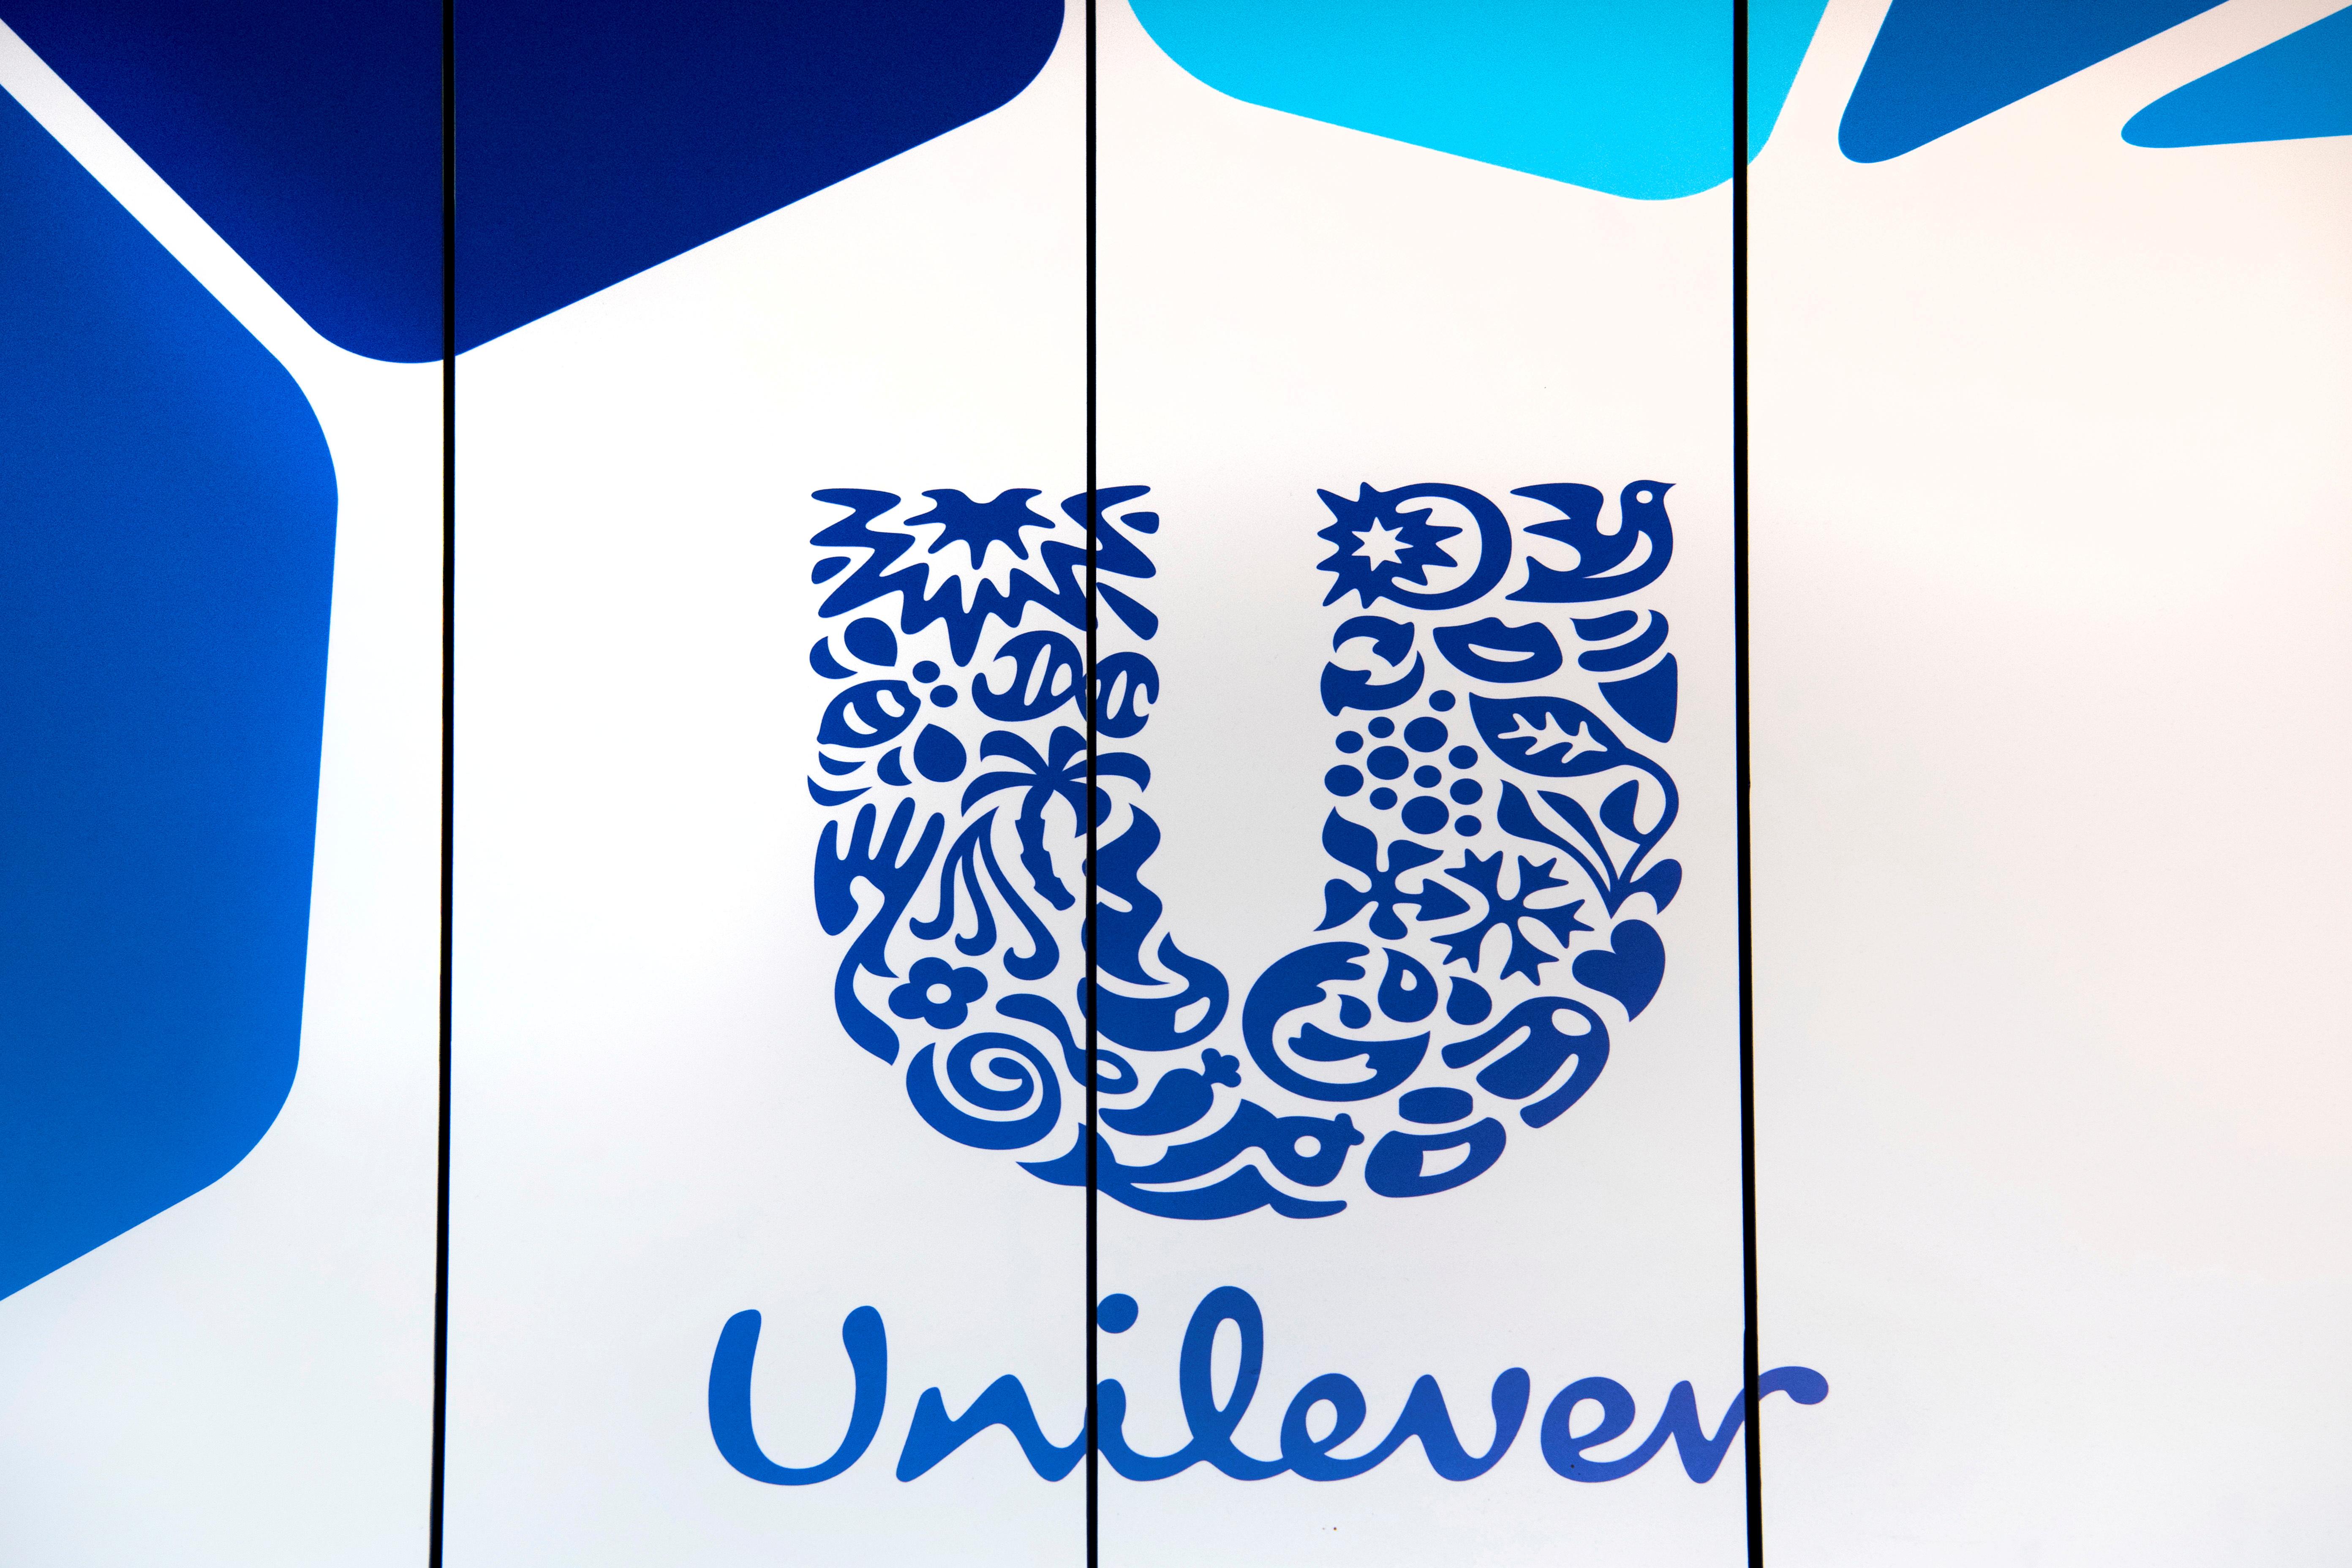 The logo of Unilever is seen at the headquarters in Rotterdam, Netherlands August 21, 2018. REUTERS/Piroschka van de Wouw